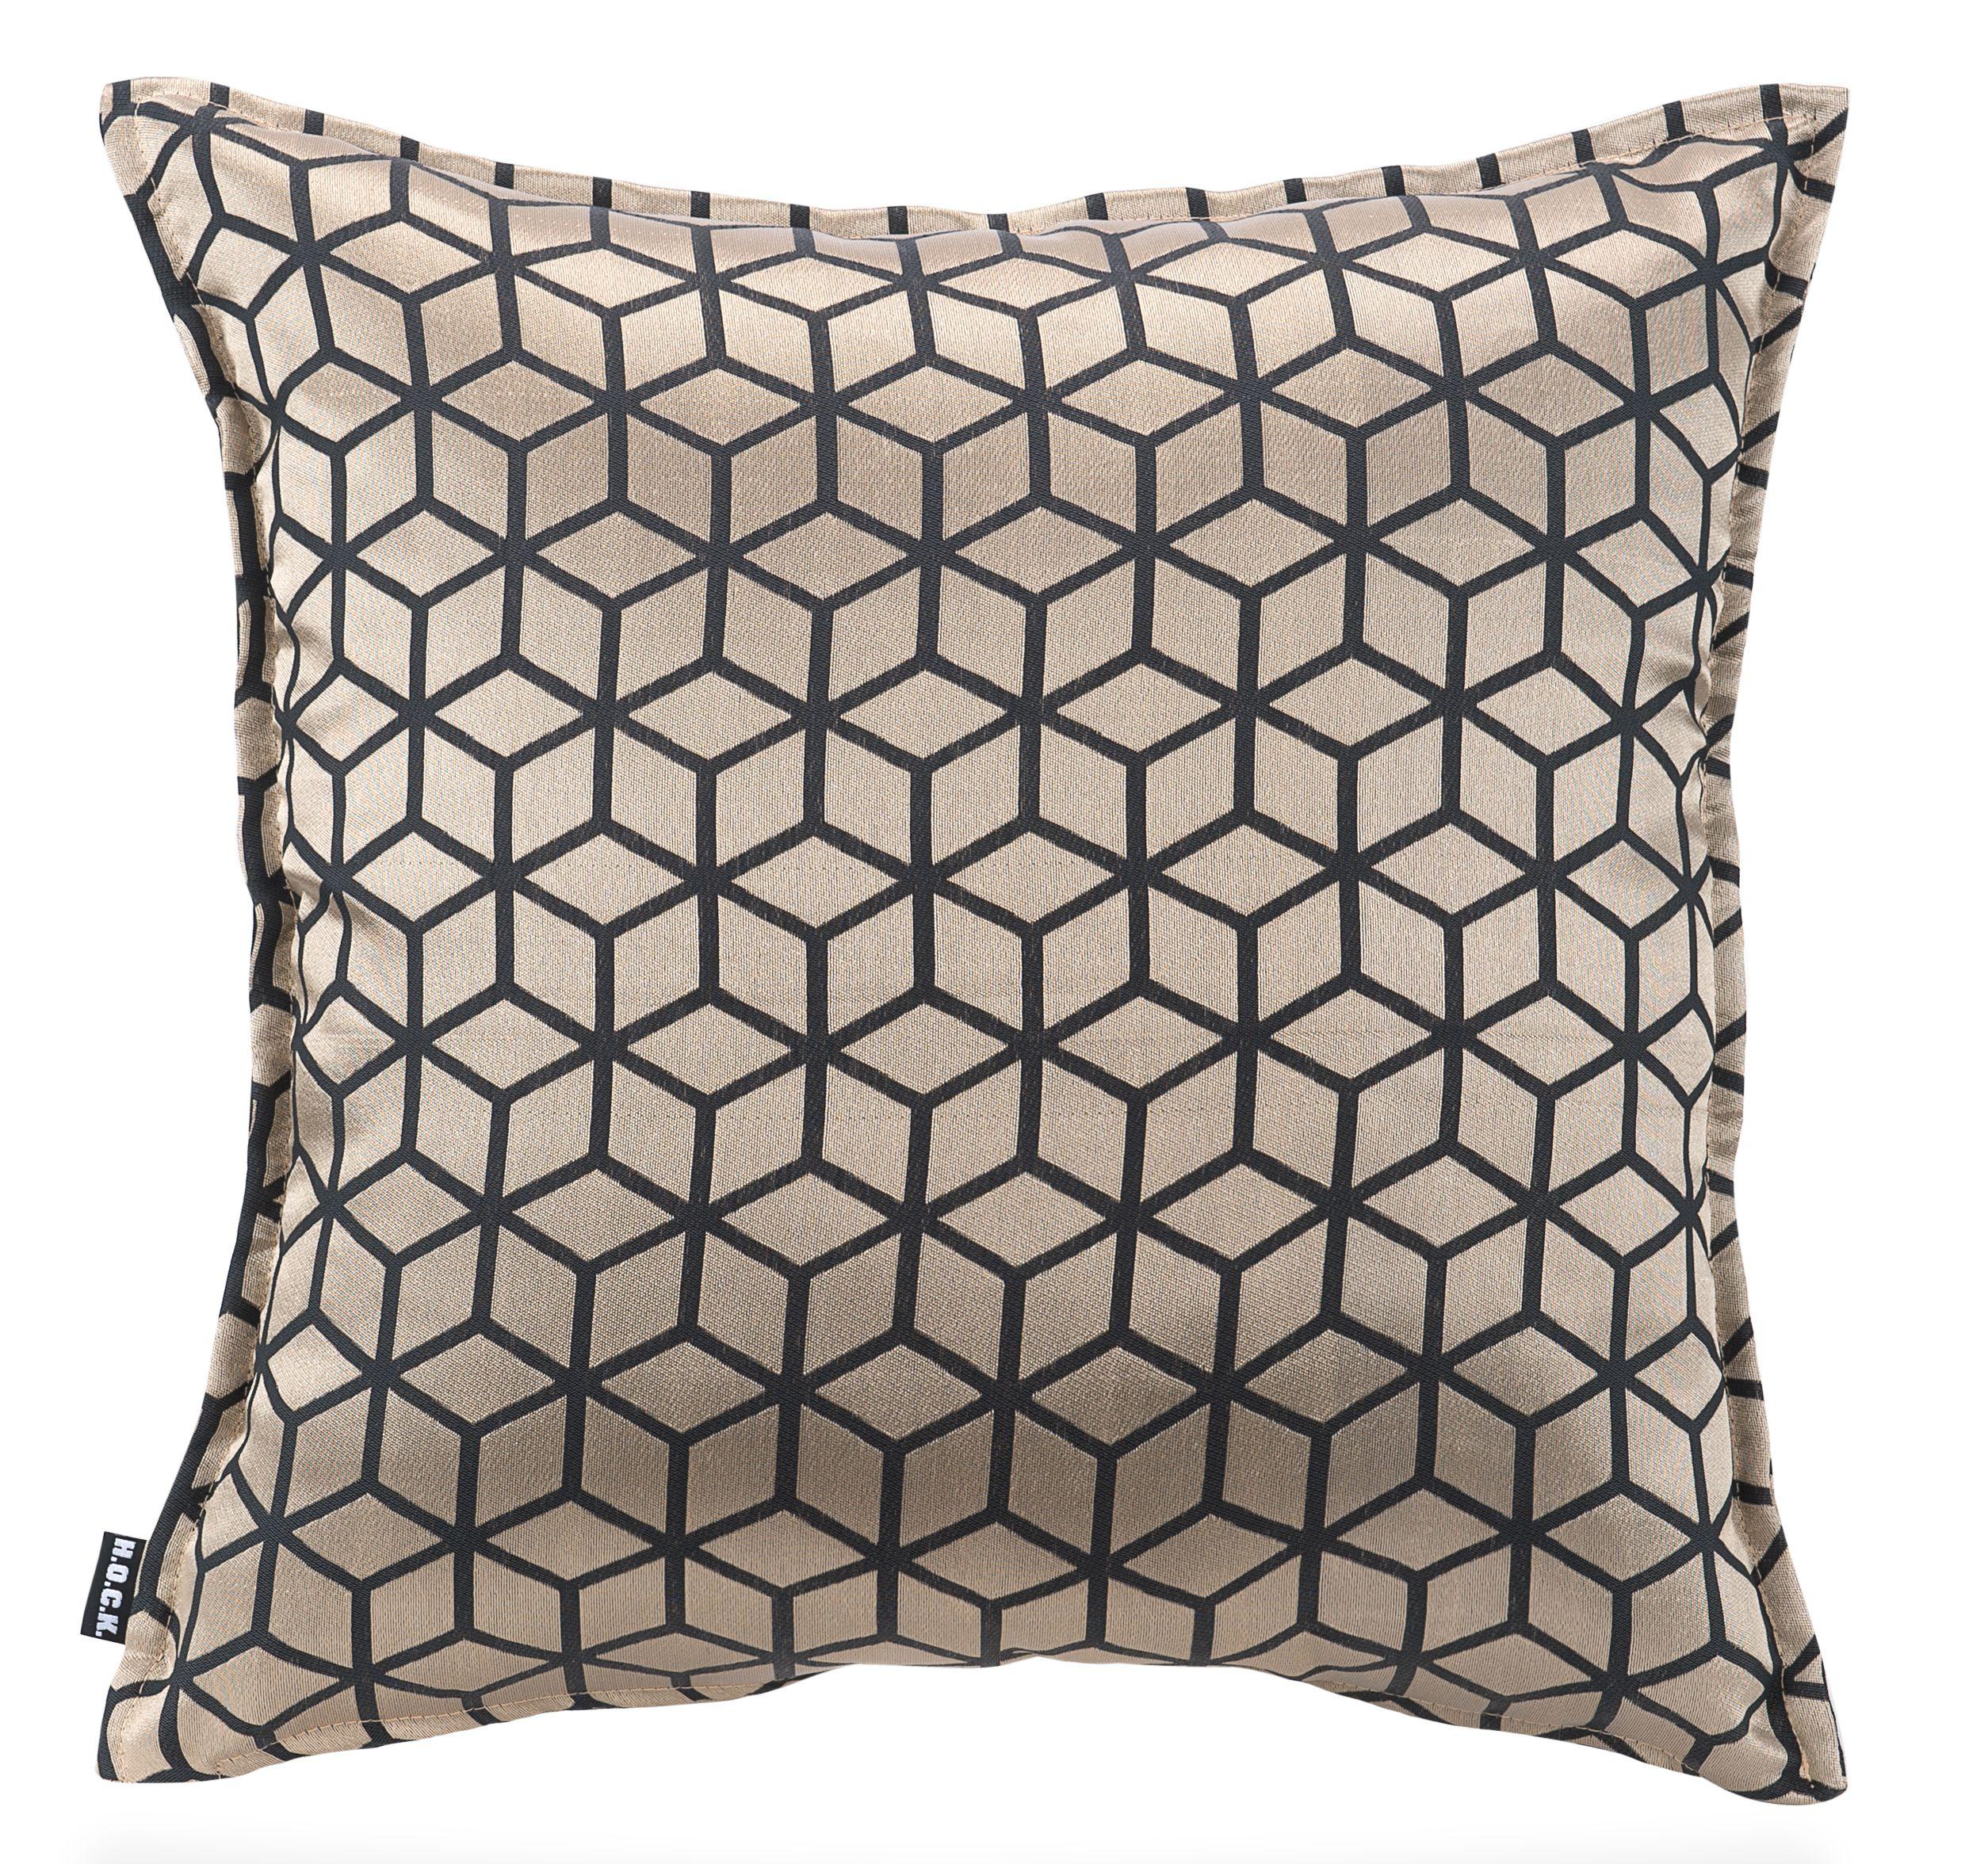 Mingle Cushions Design By Thomas Bentzen Muuto Pillows